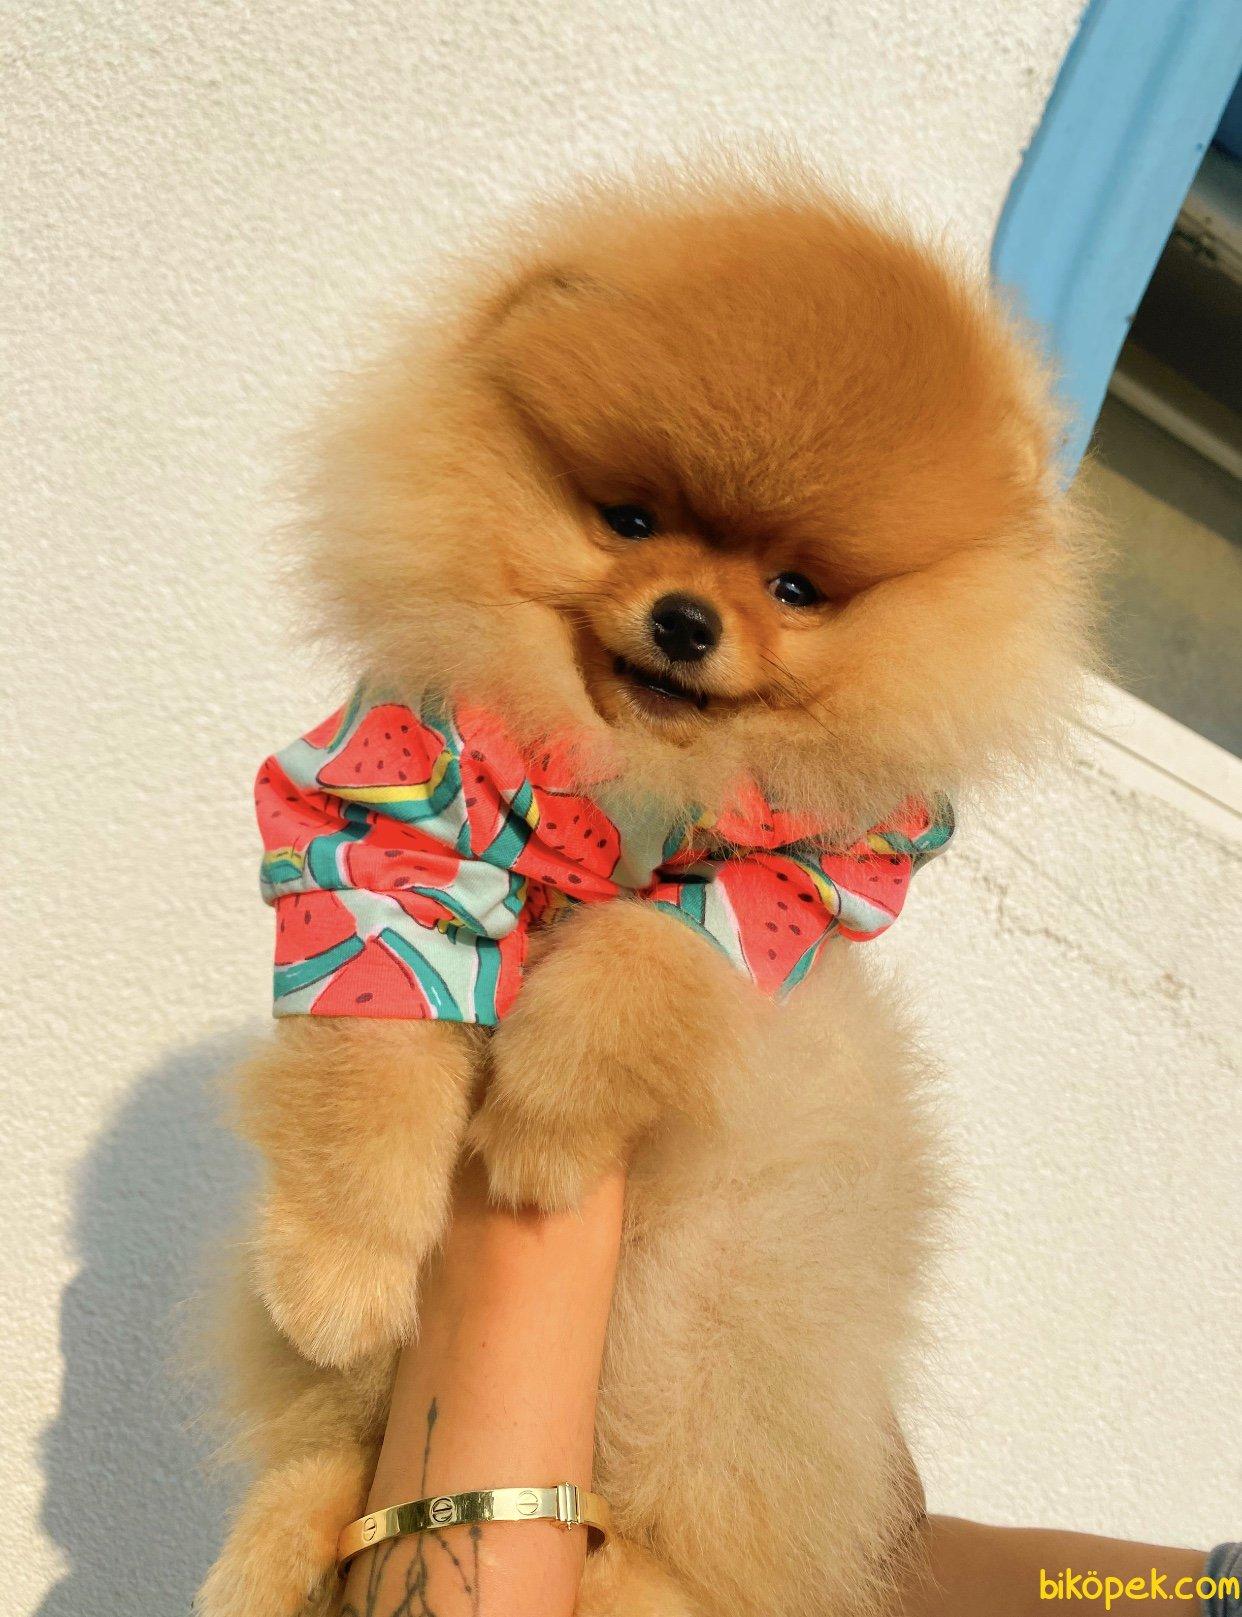 Orjinal Teddy Bear Pomeranian Boo Irk Belgeli 3